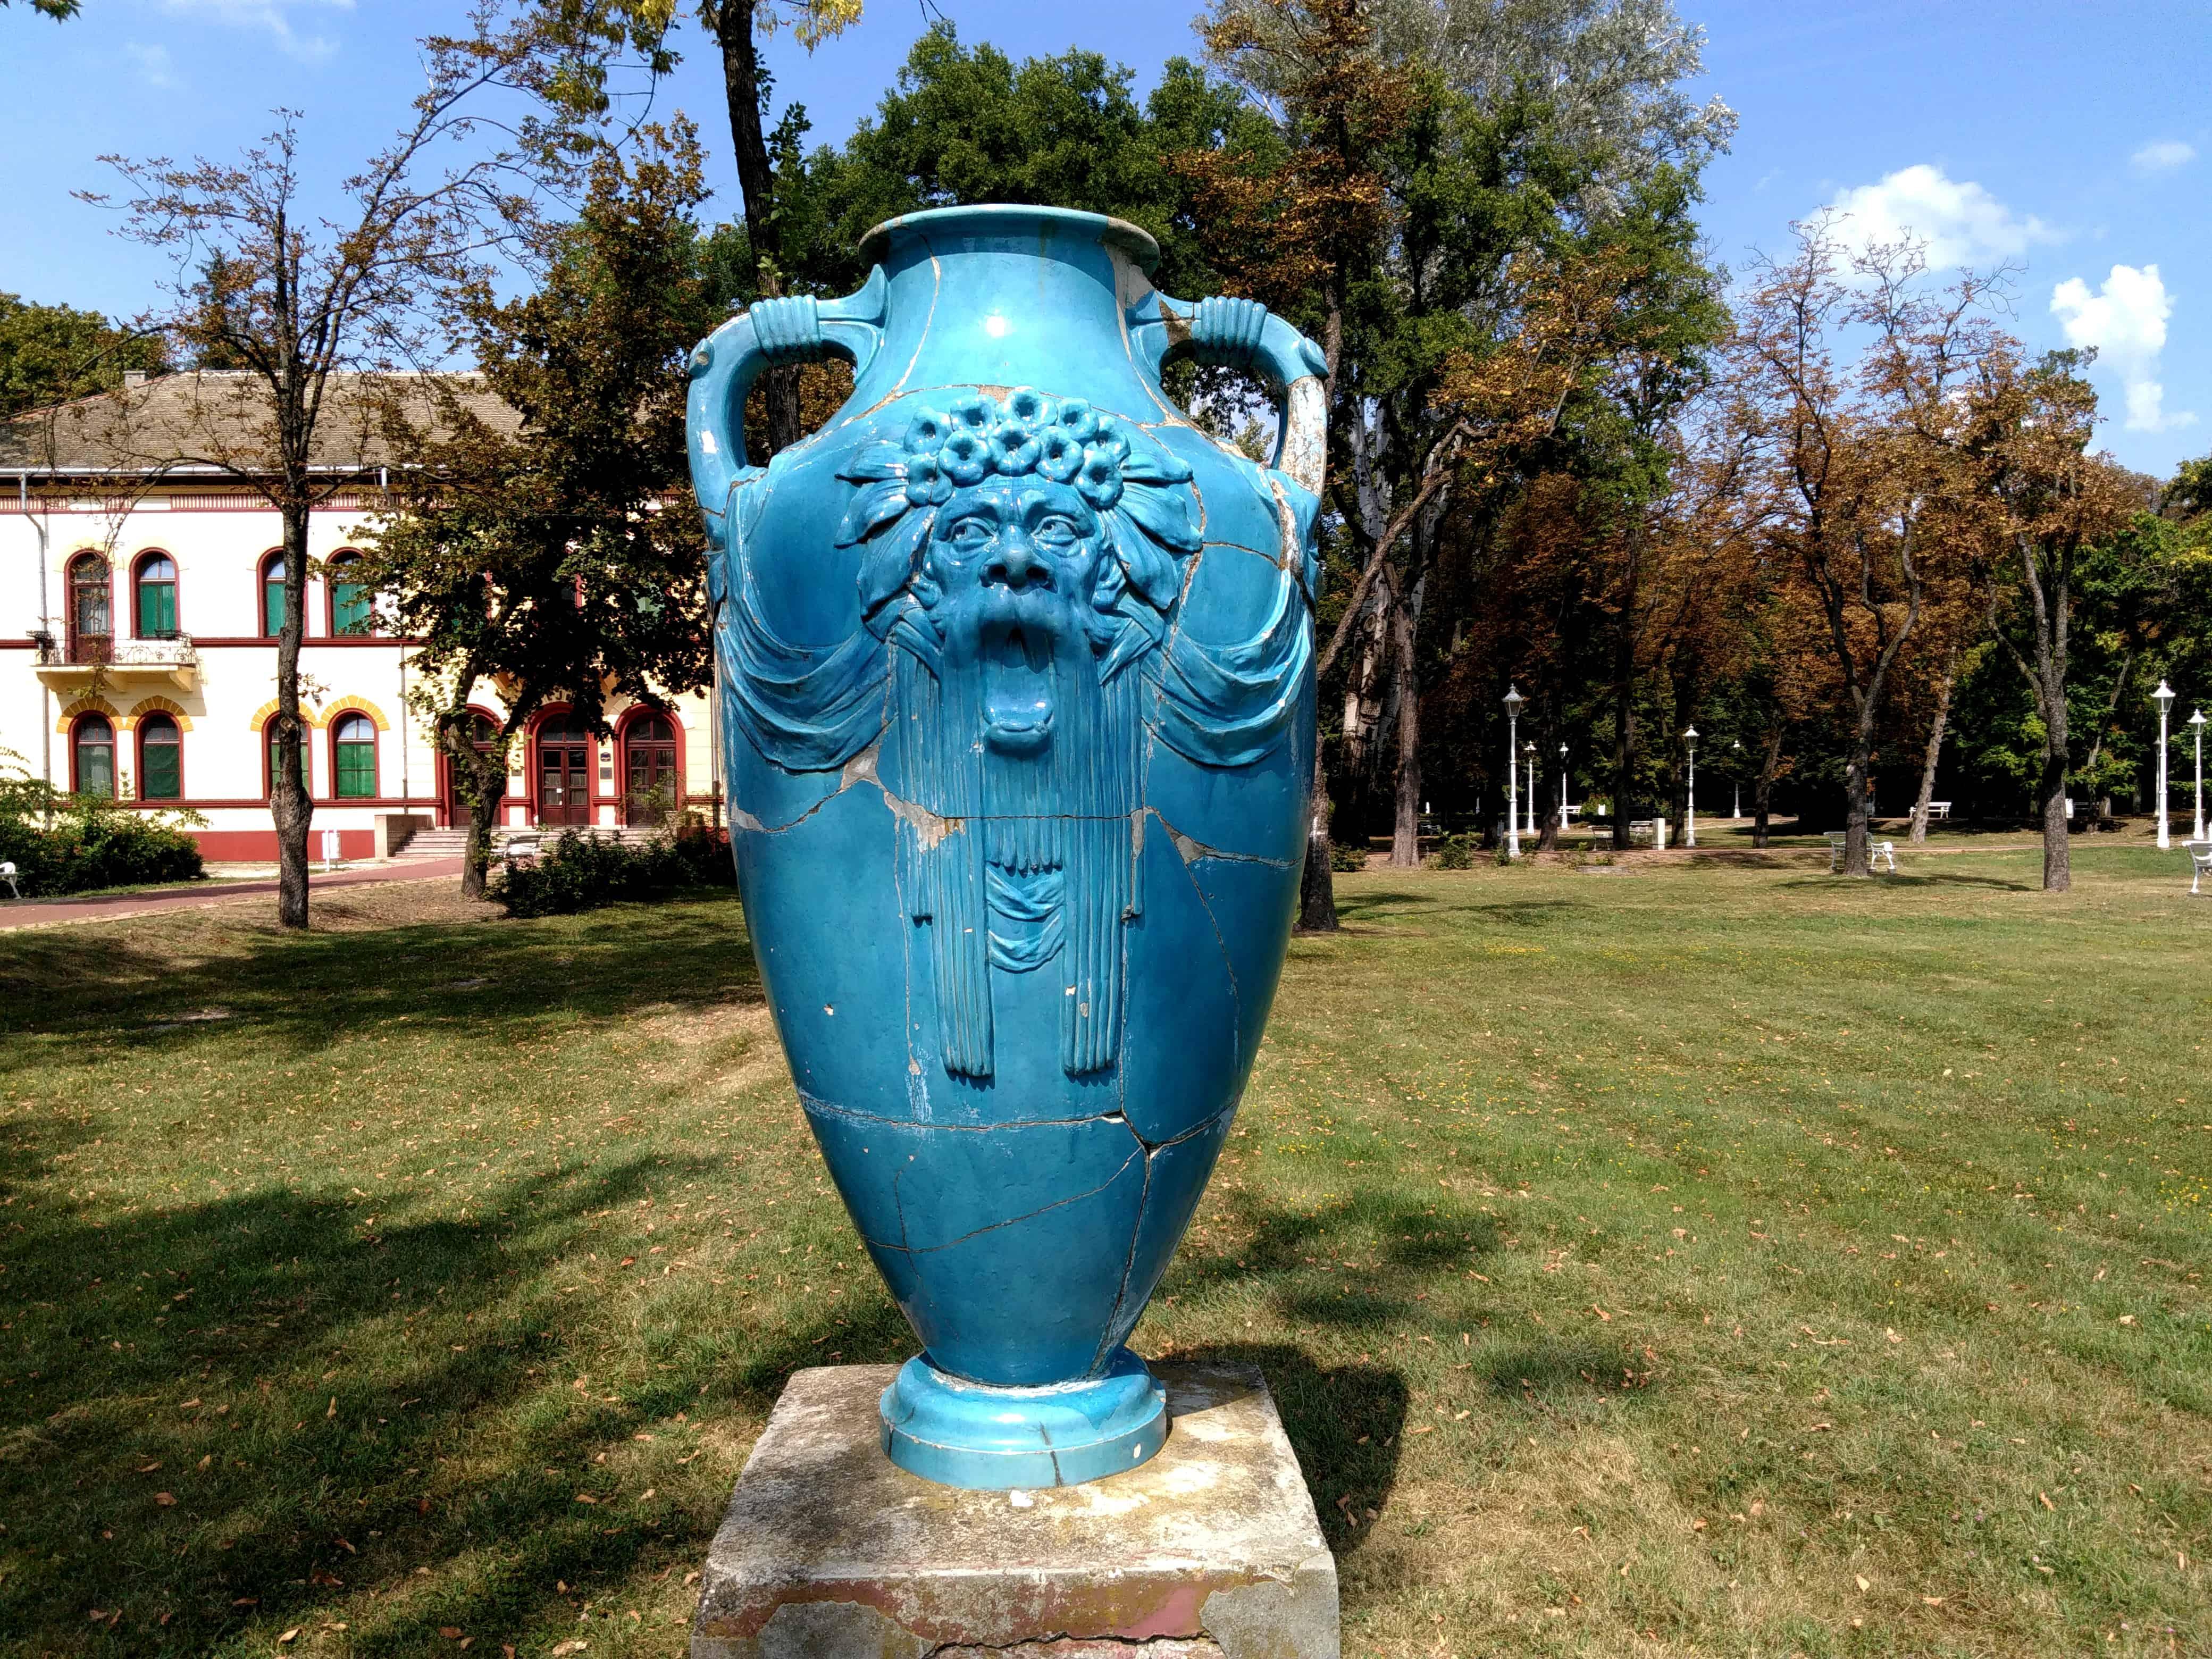 Pottery Art Sculpture Blue Vase Object Tree Grass Outdoor Sky